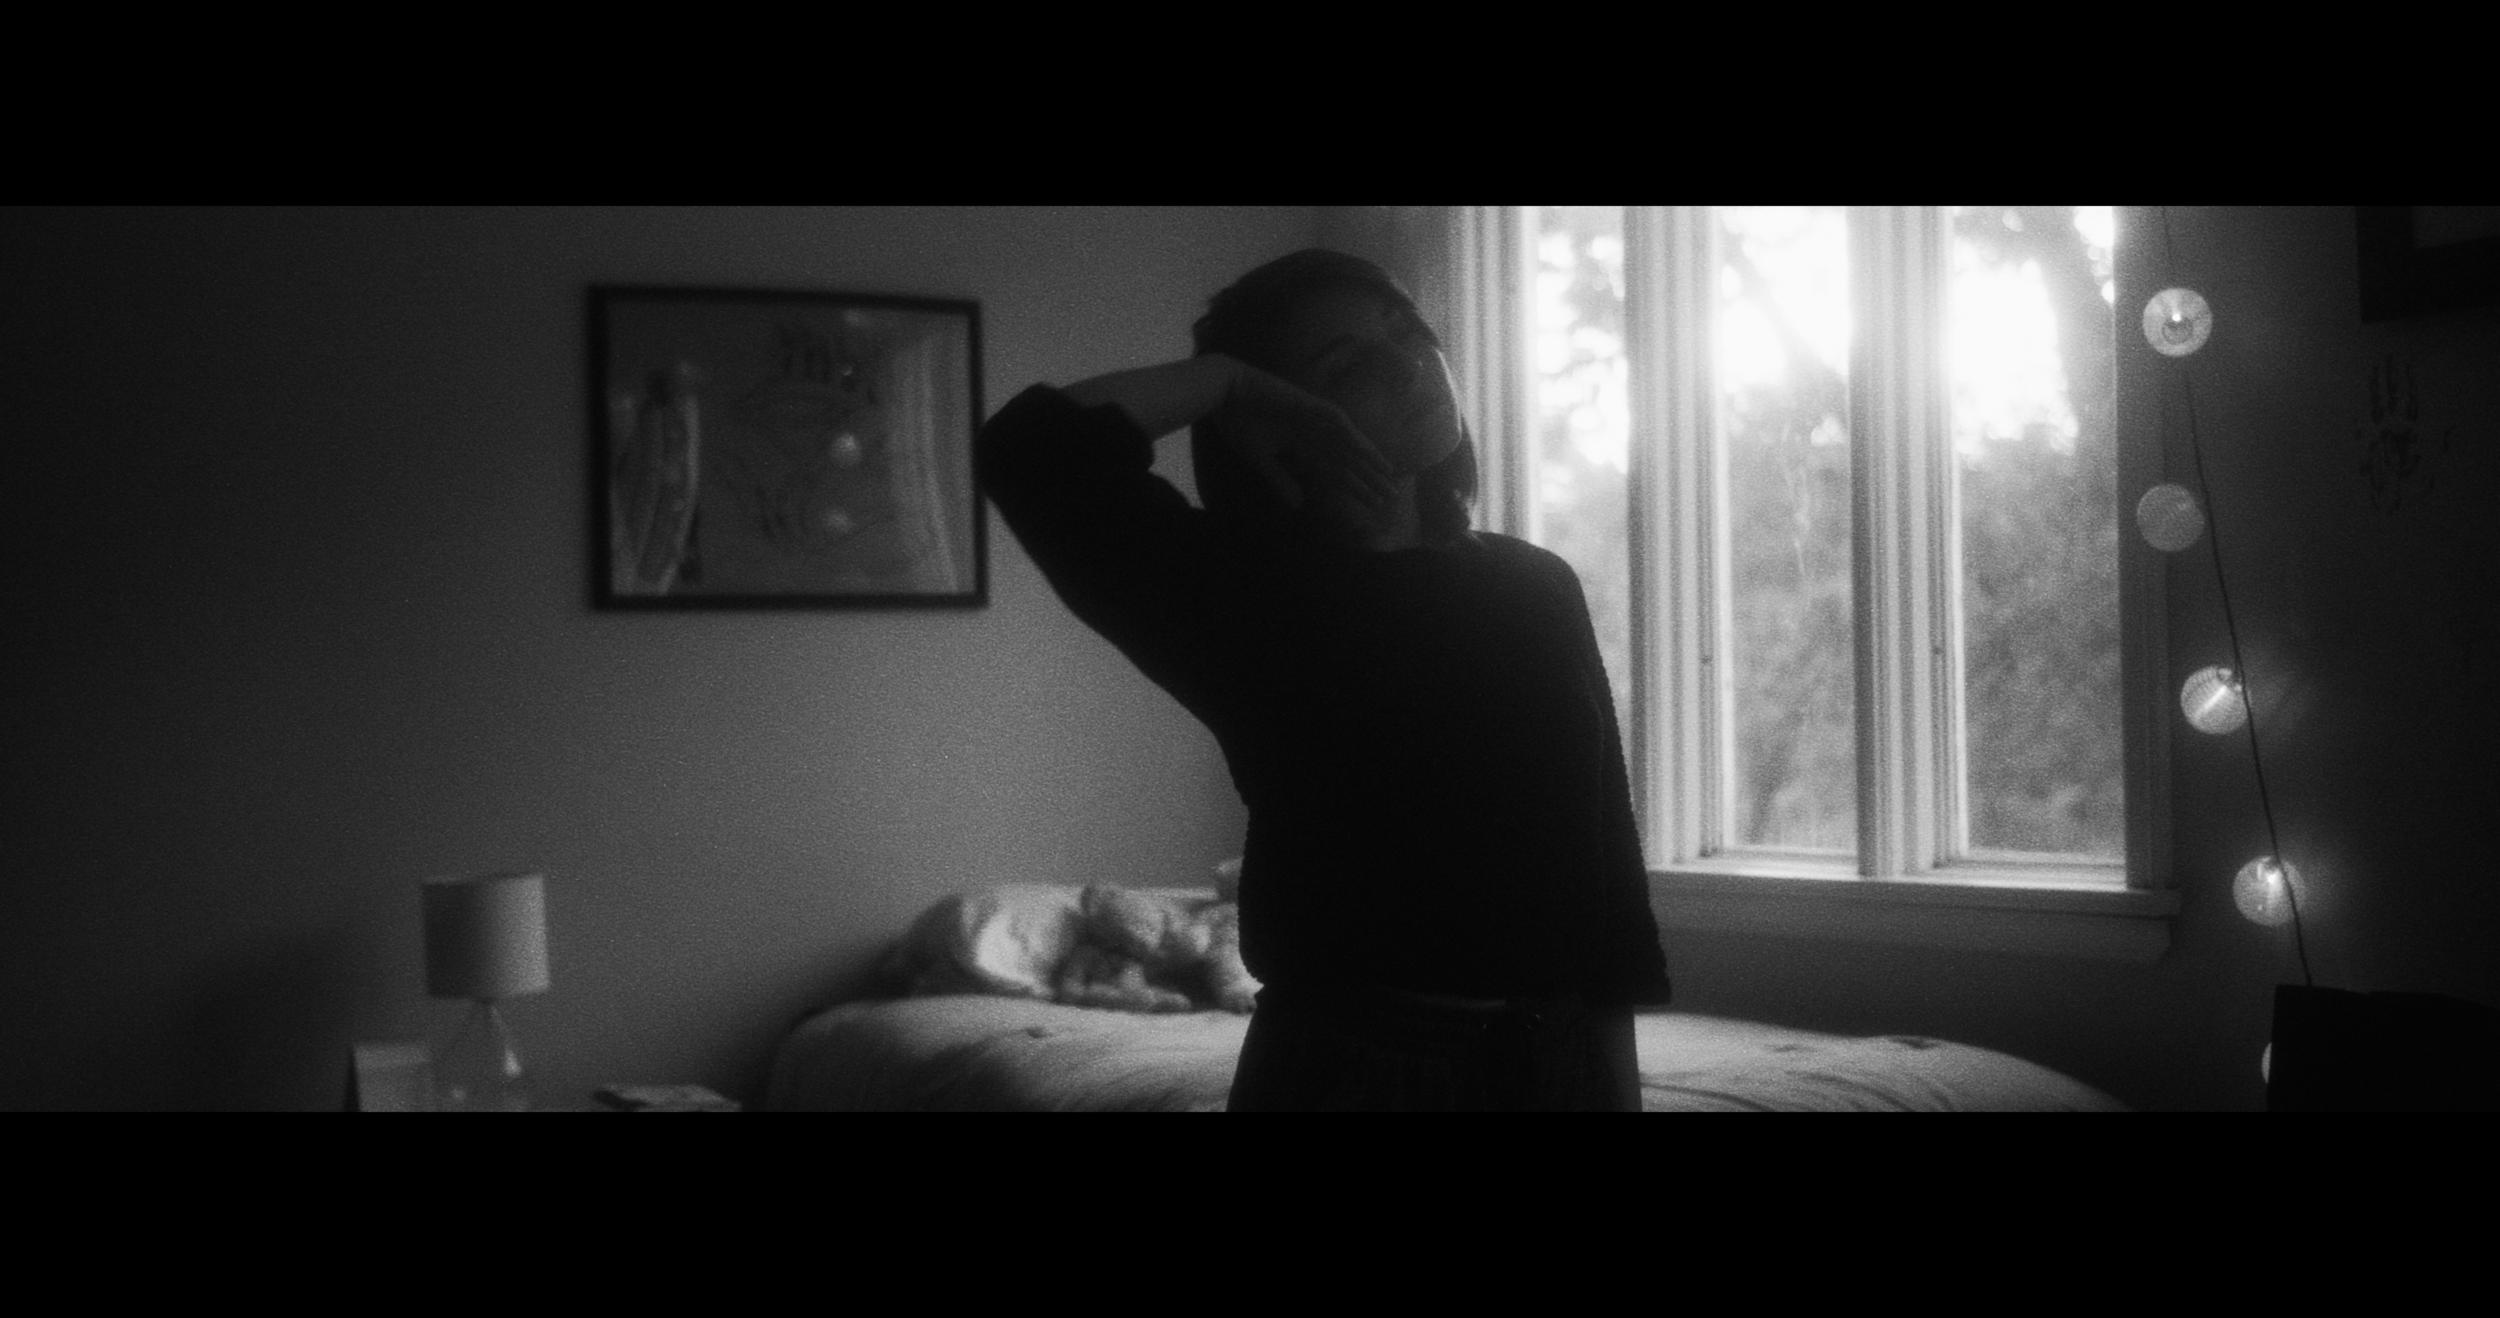 photography filming Formatt 4x4 supermist black 1 filter